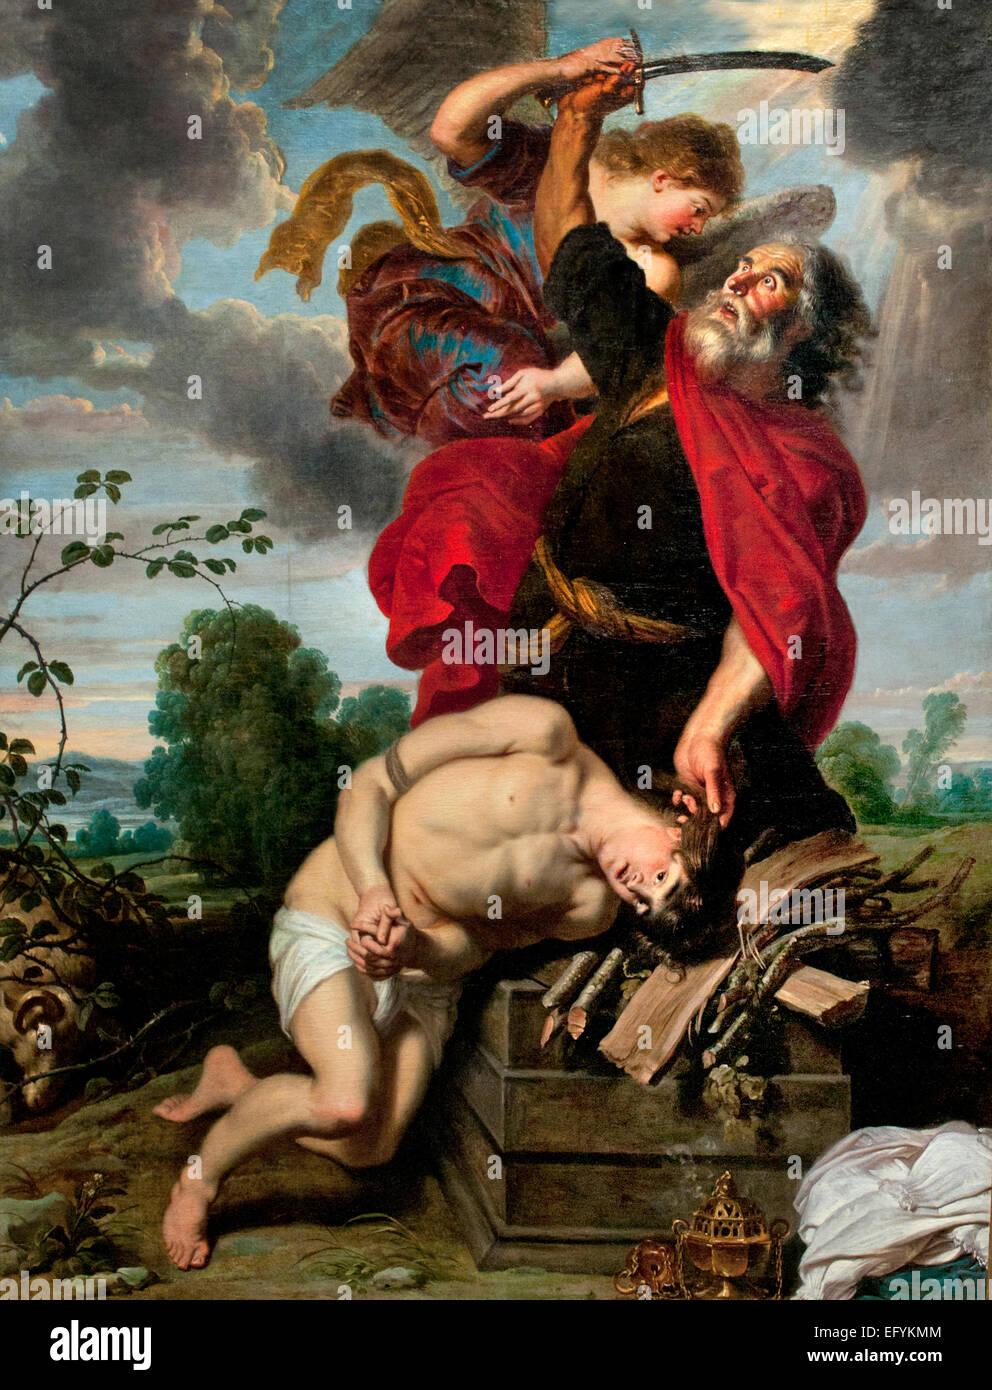 The Sacrifice of Abraham 1631 Cornelis de Vos 1584-1651 and Jan Wildens  Flemish Belgian - Stock Image